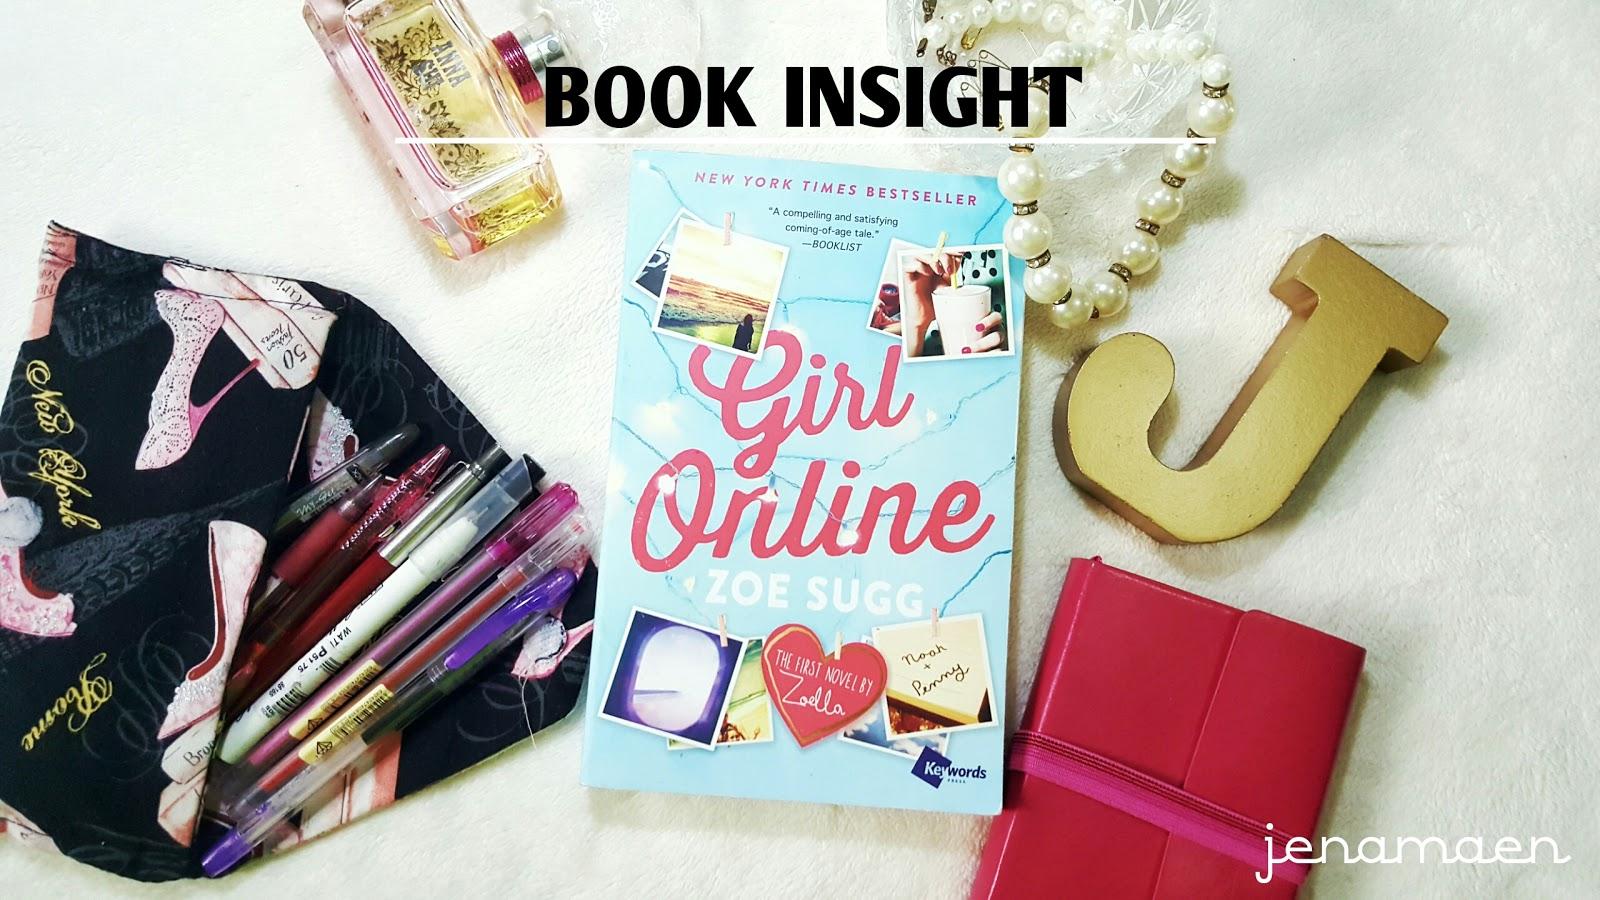 Book Insight: Girl Online